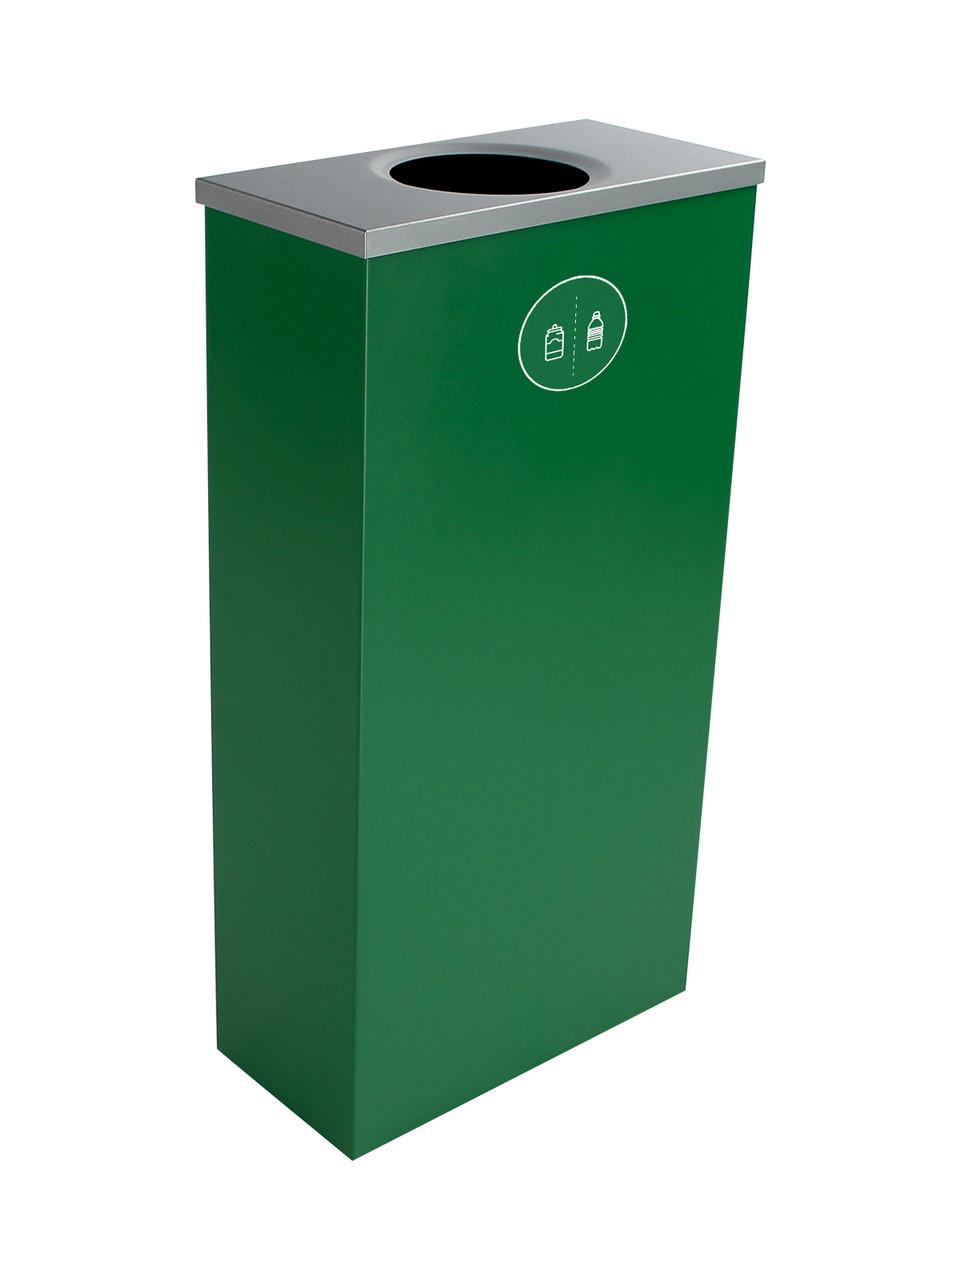 10 Gallon Steel Spectrum Slim Bottles & Cans Collector Green 8107056-1